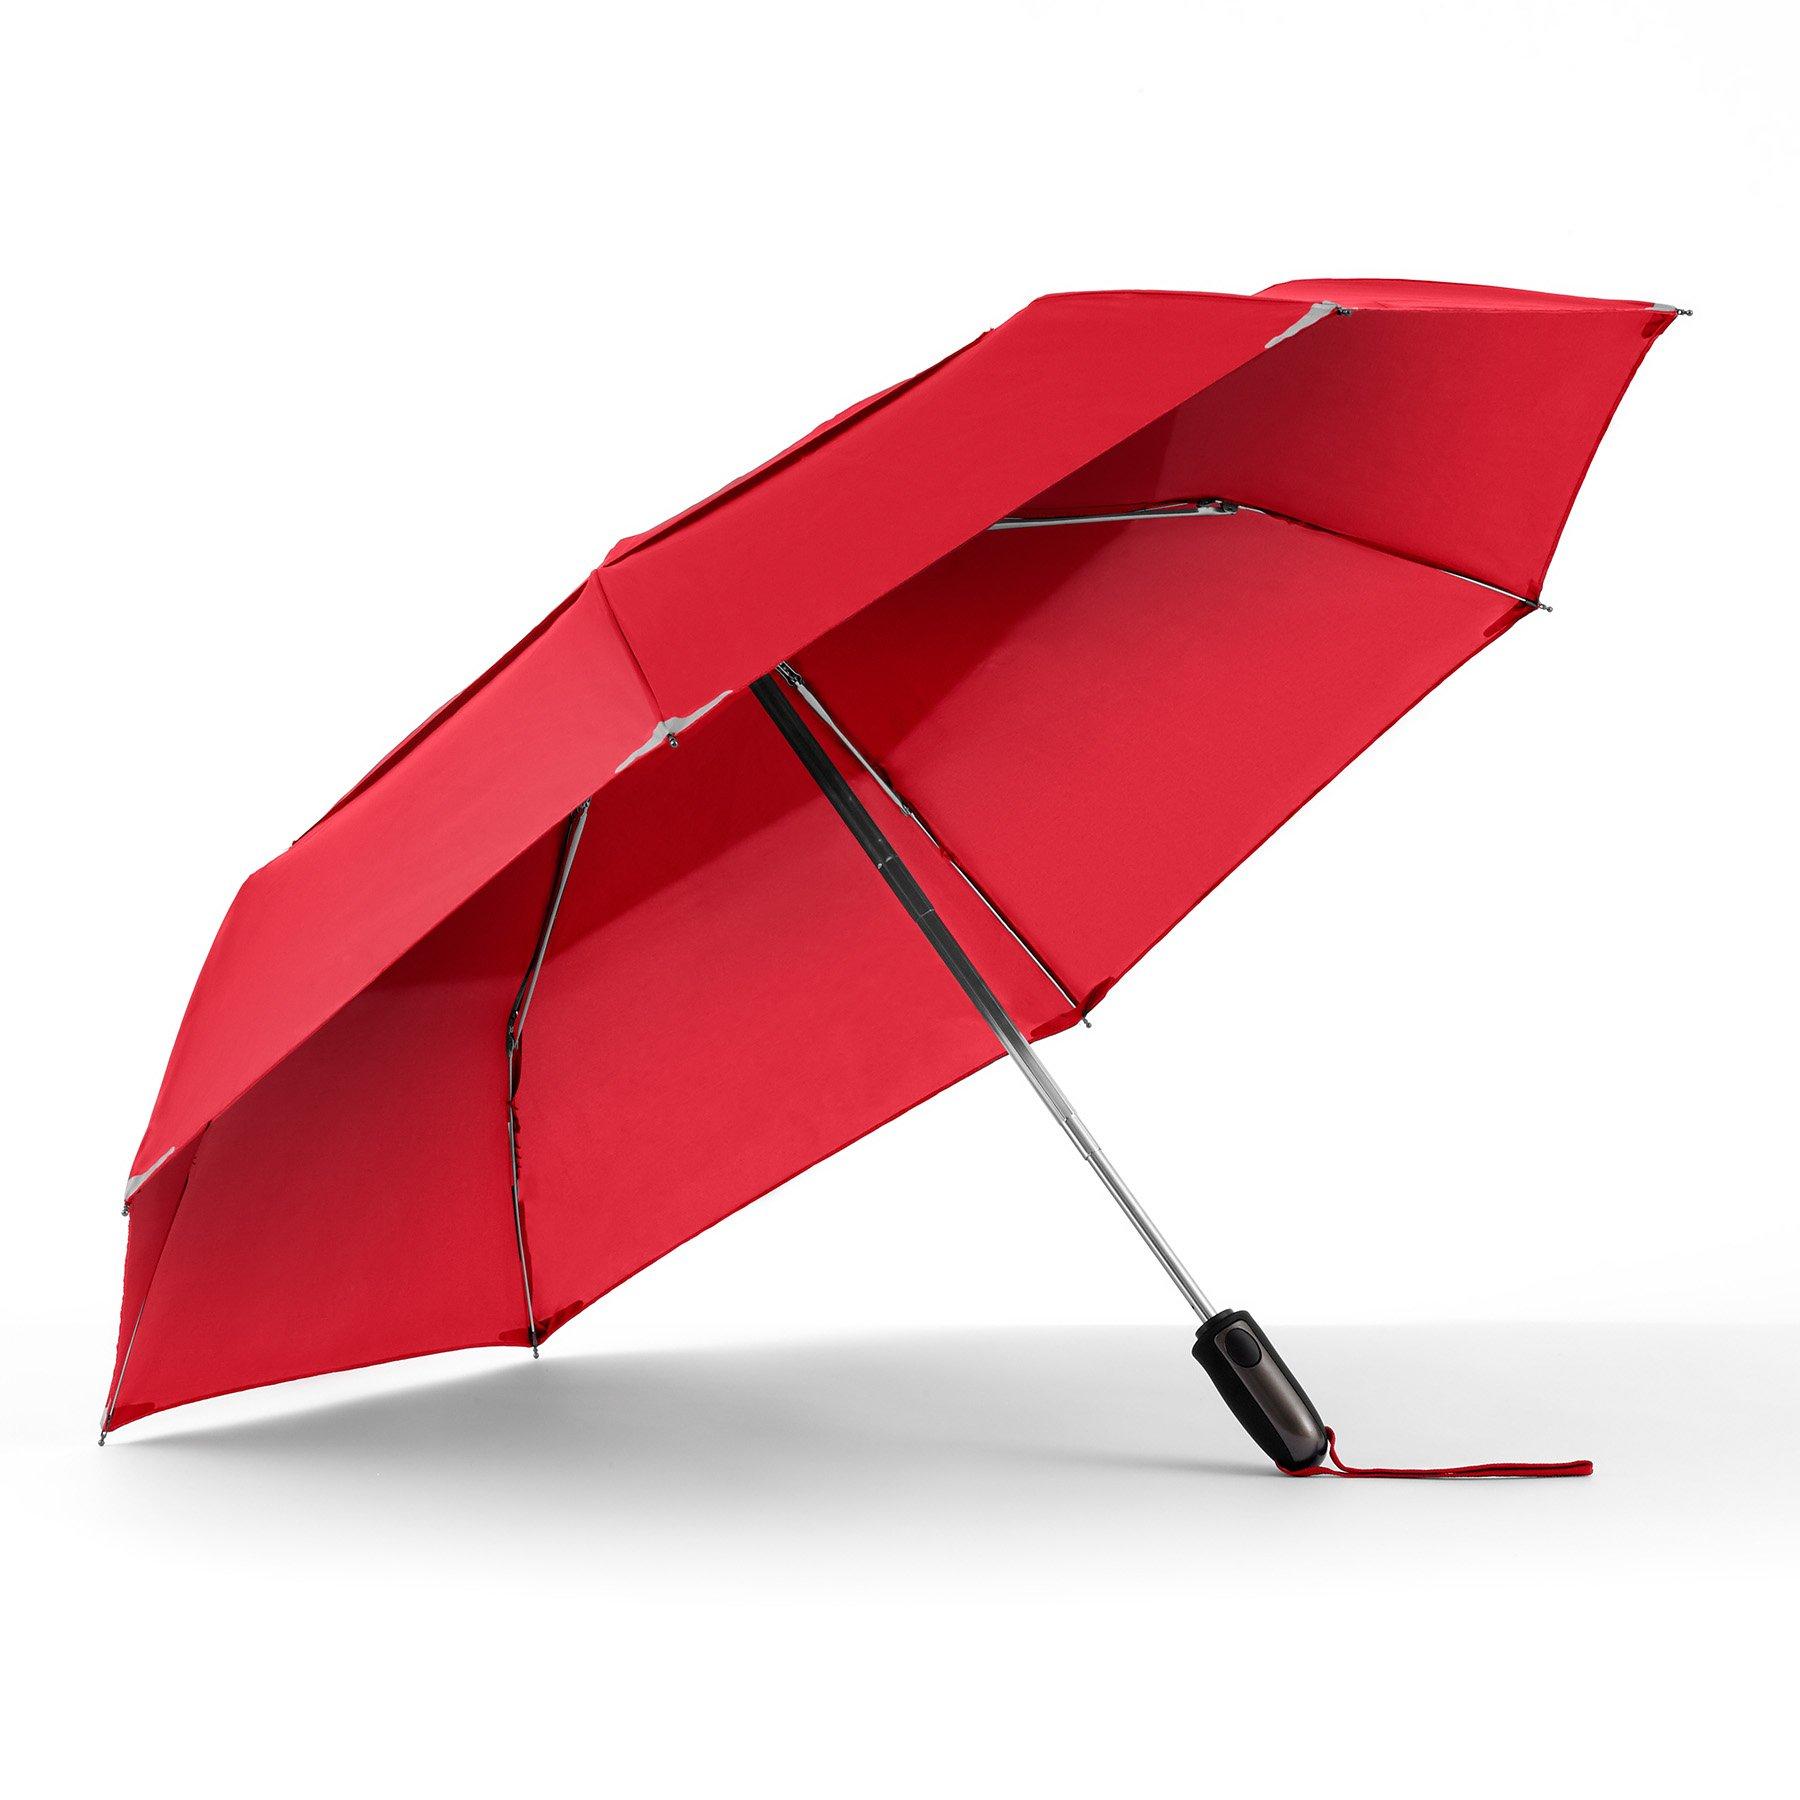 Galleon - ShedRain WalkSafe Vented Auto Open Umbrella: Red